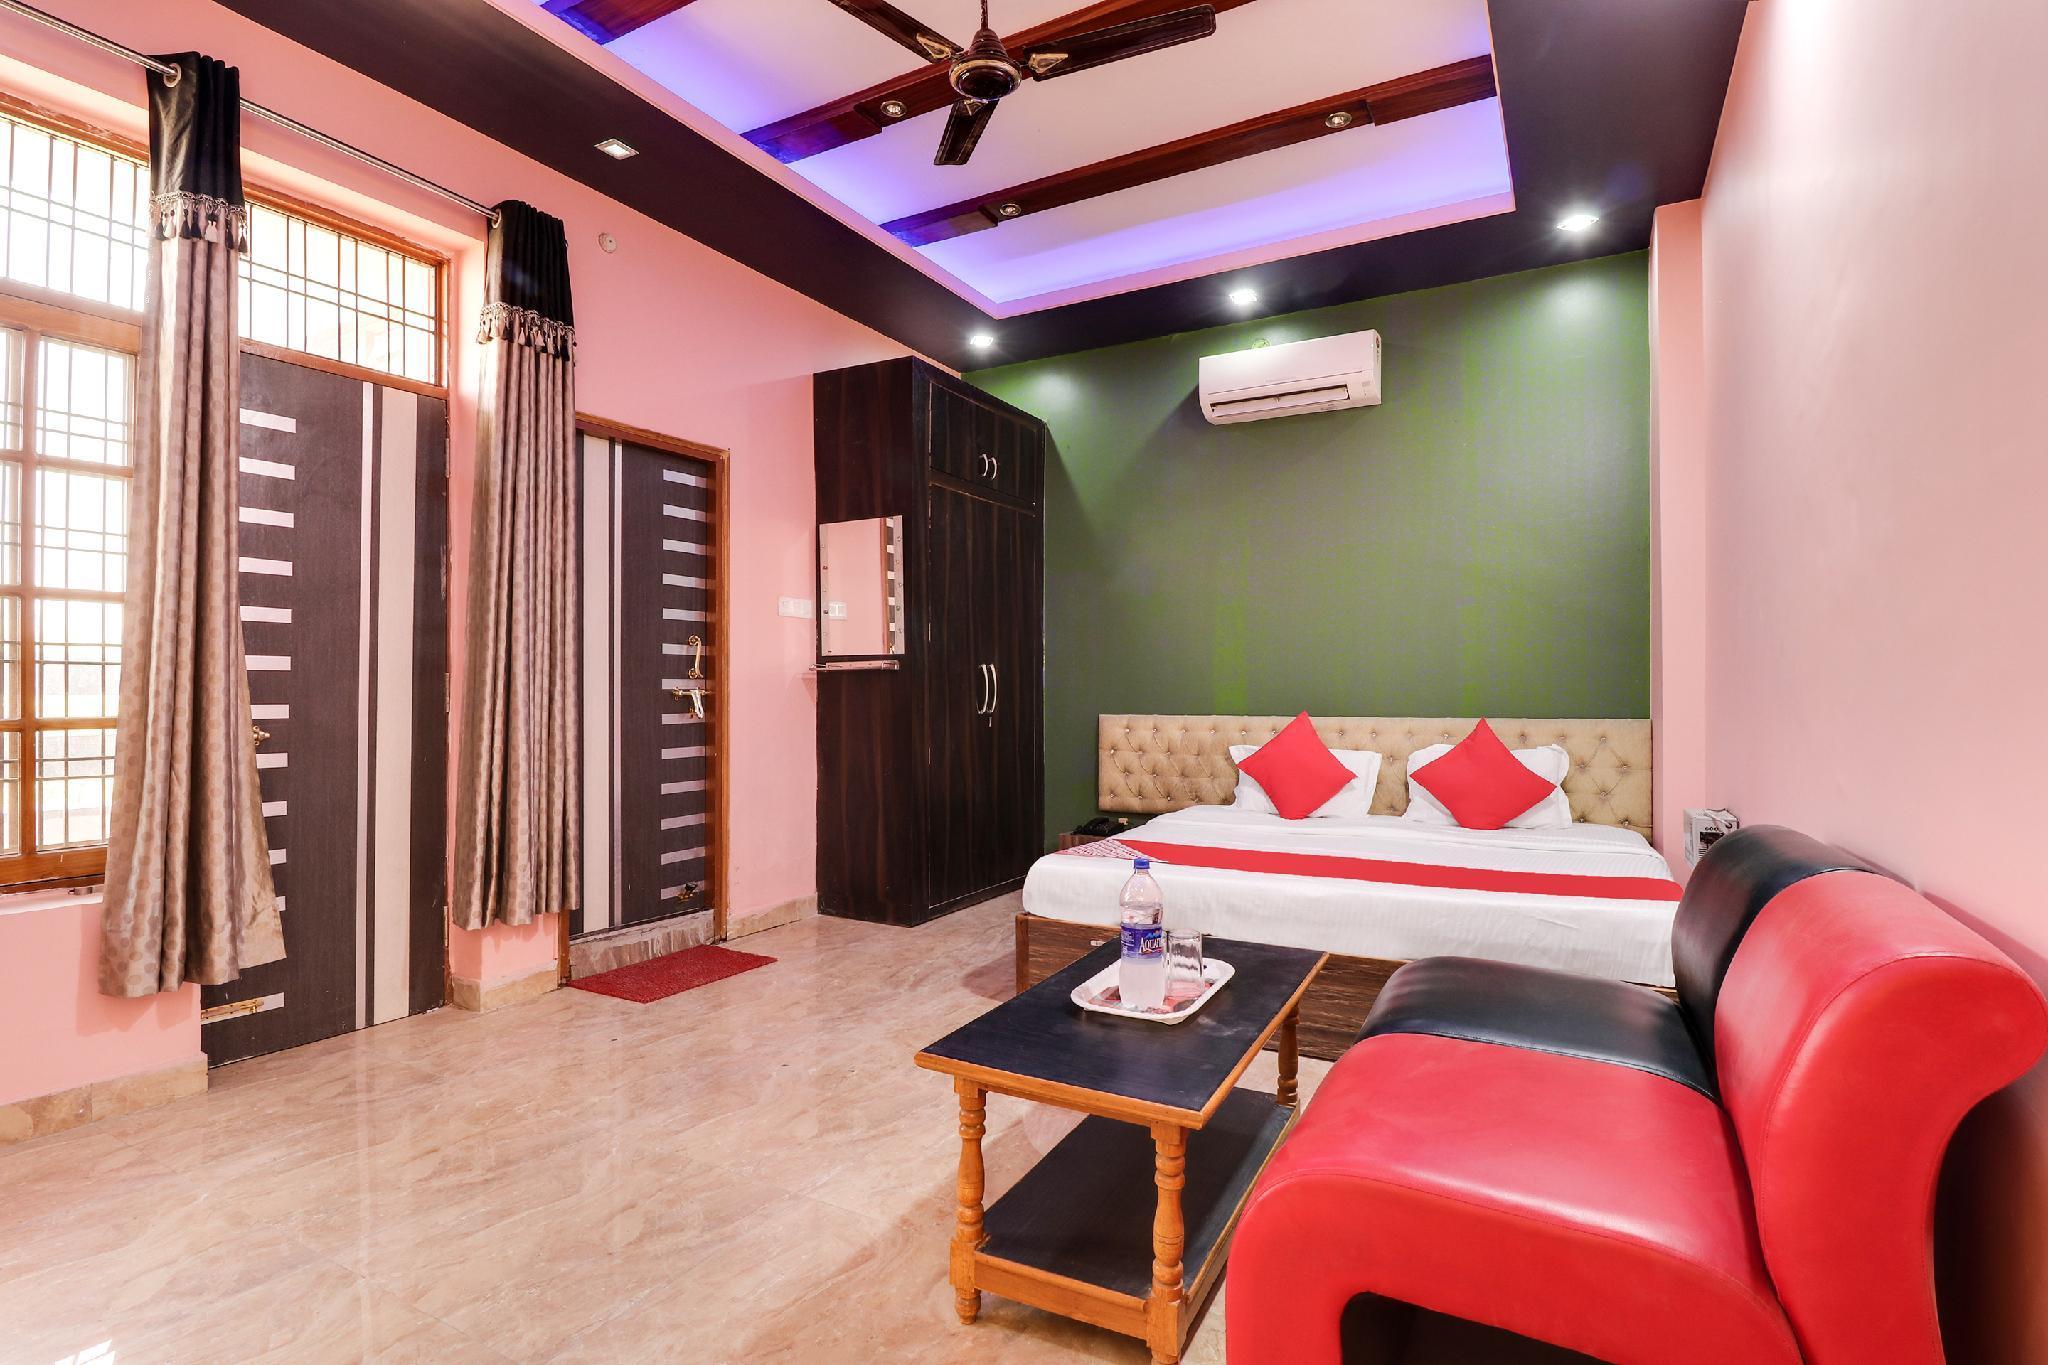 OYO 43468 Hotel Supriya Palace